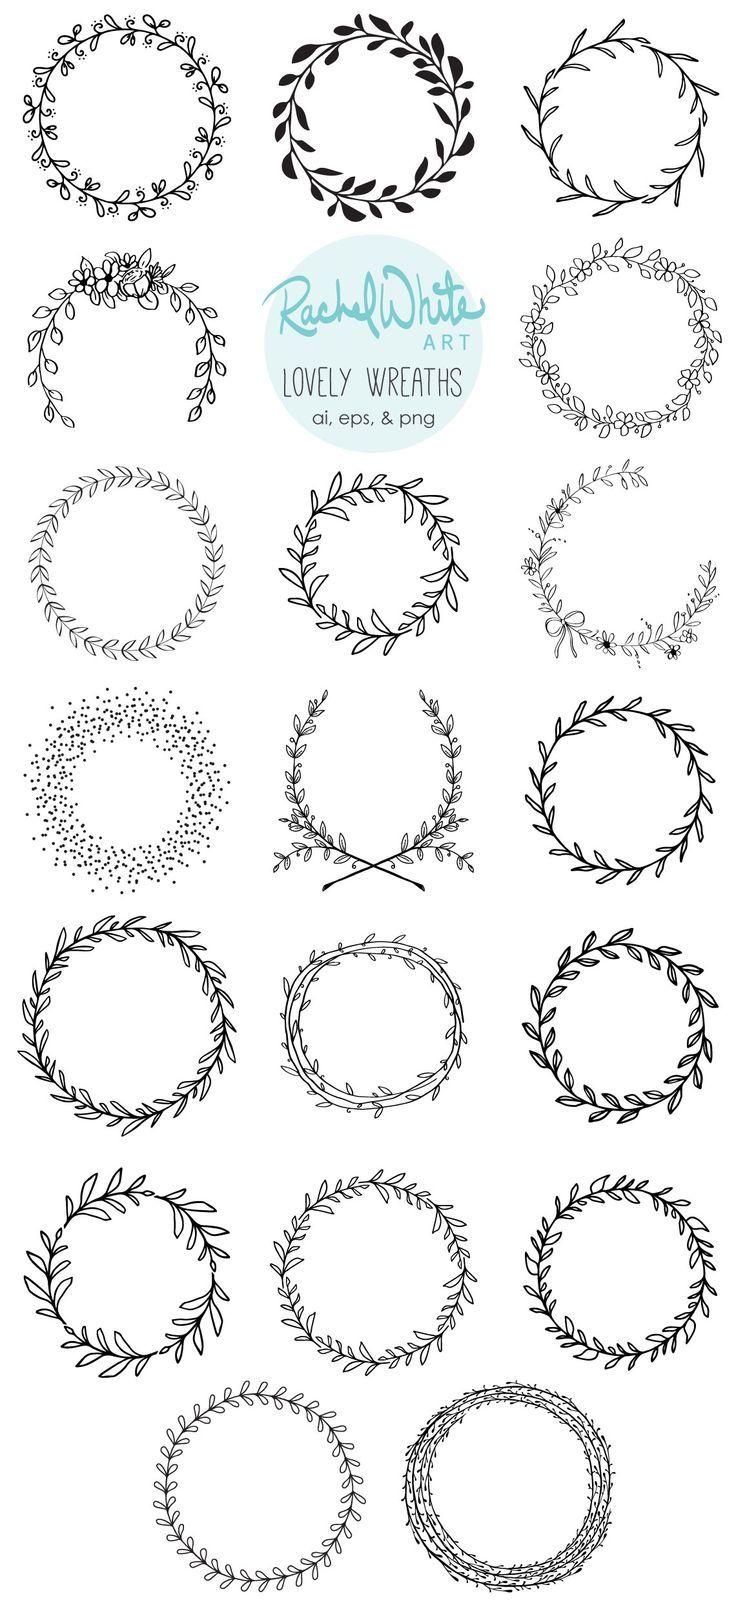 lovely wreaths vector illustrations ai eps and png 19 unique images instant downl wreath illustration flower watercolor glas vektor vektorgrafik erstellen gimp